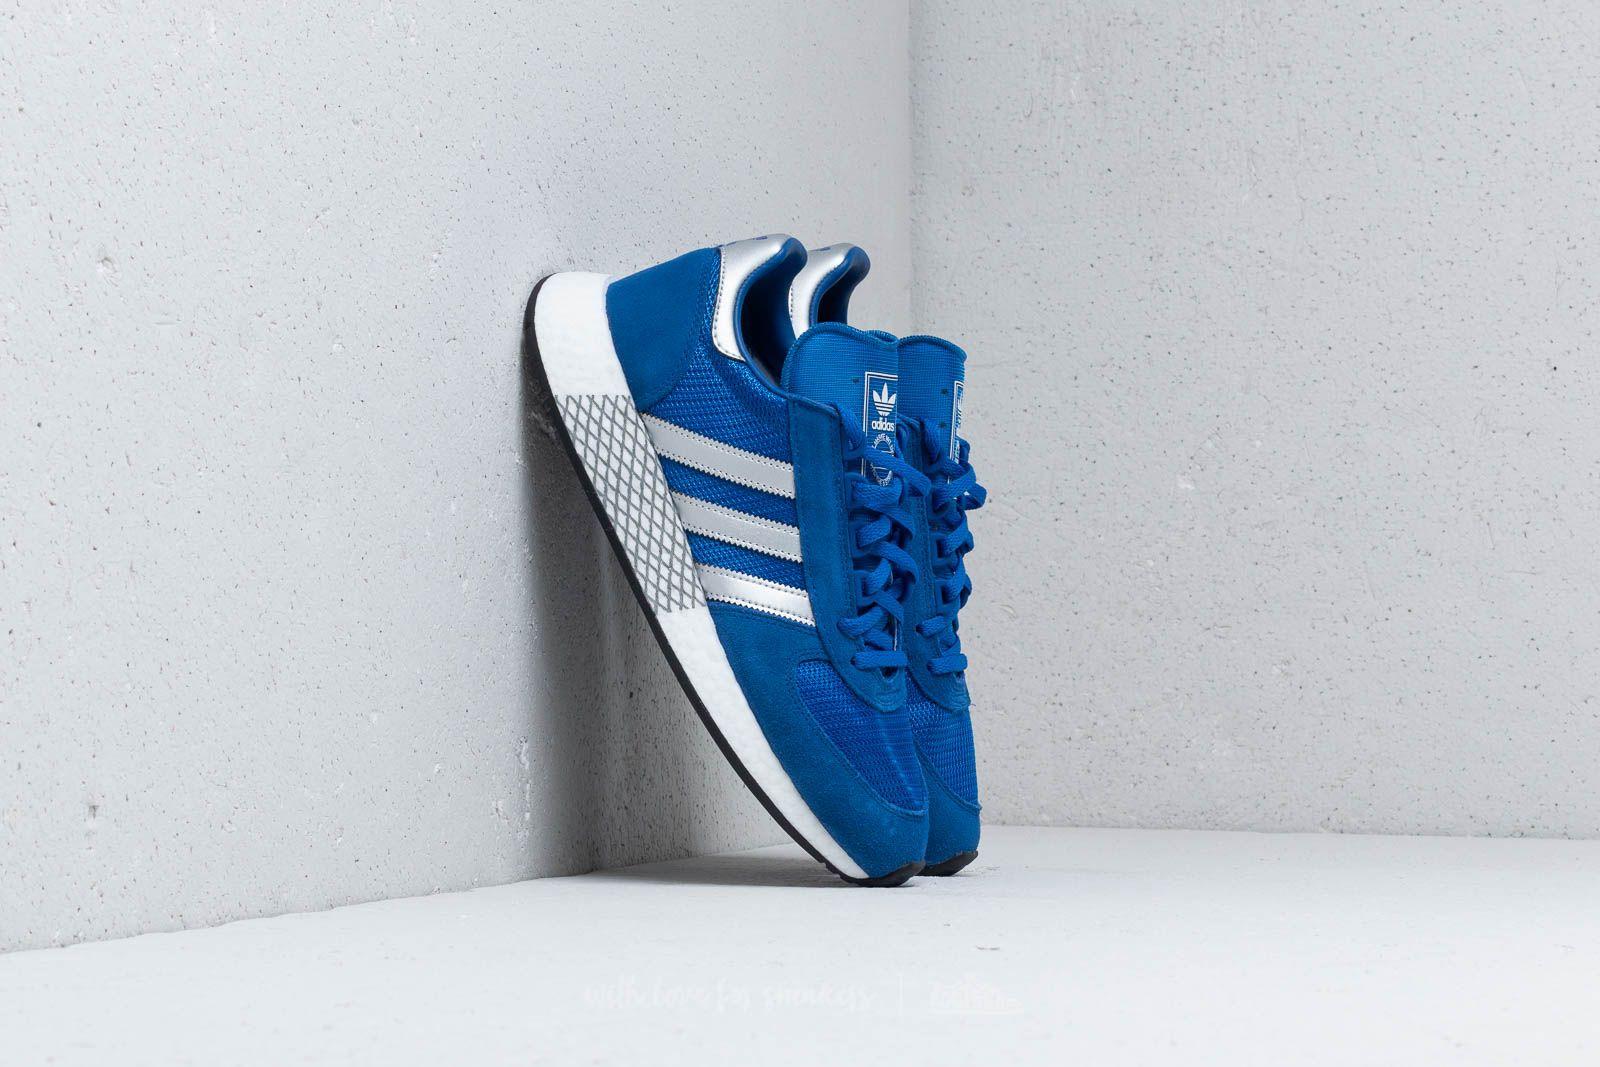 47ae559c36 adidas Marathon x 5923 Blue/ Silver Metallic/ Collegiate Royal nagyszerű  árakon 43 957 Ft